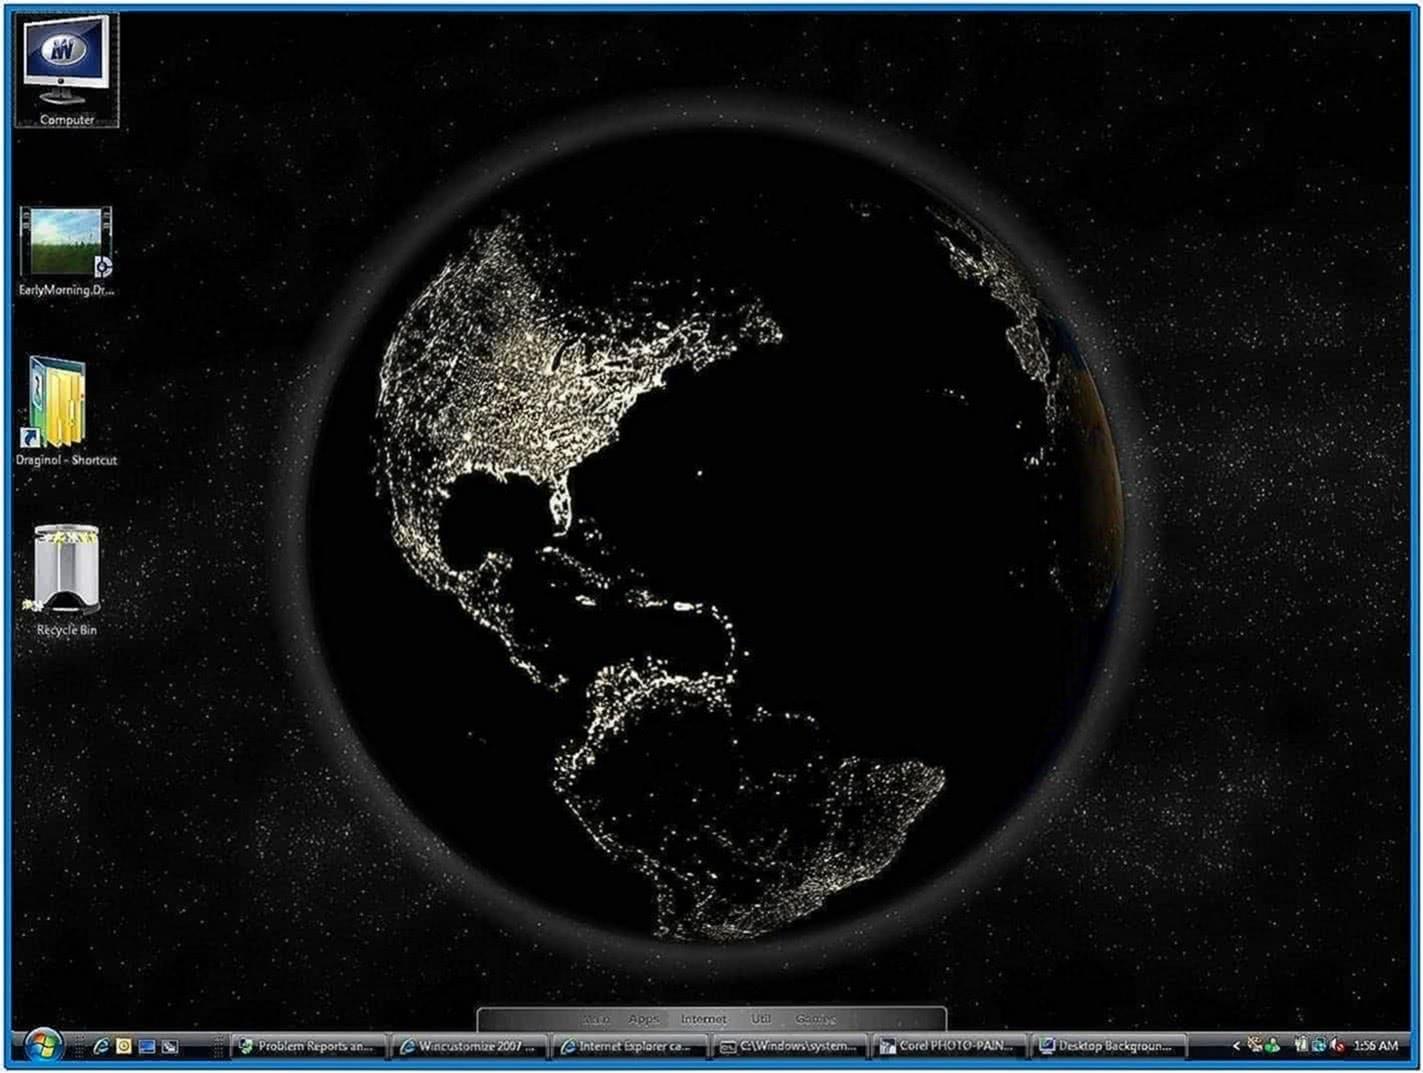 Animated Screensavers Vista Free | Funny Screensavers